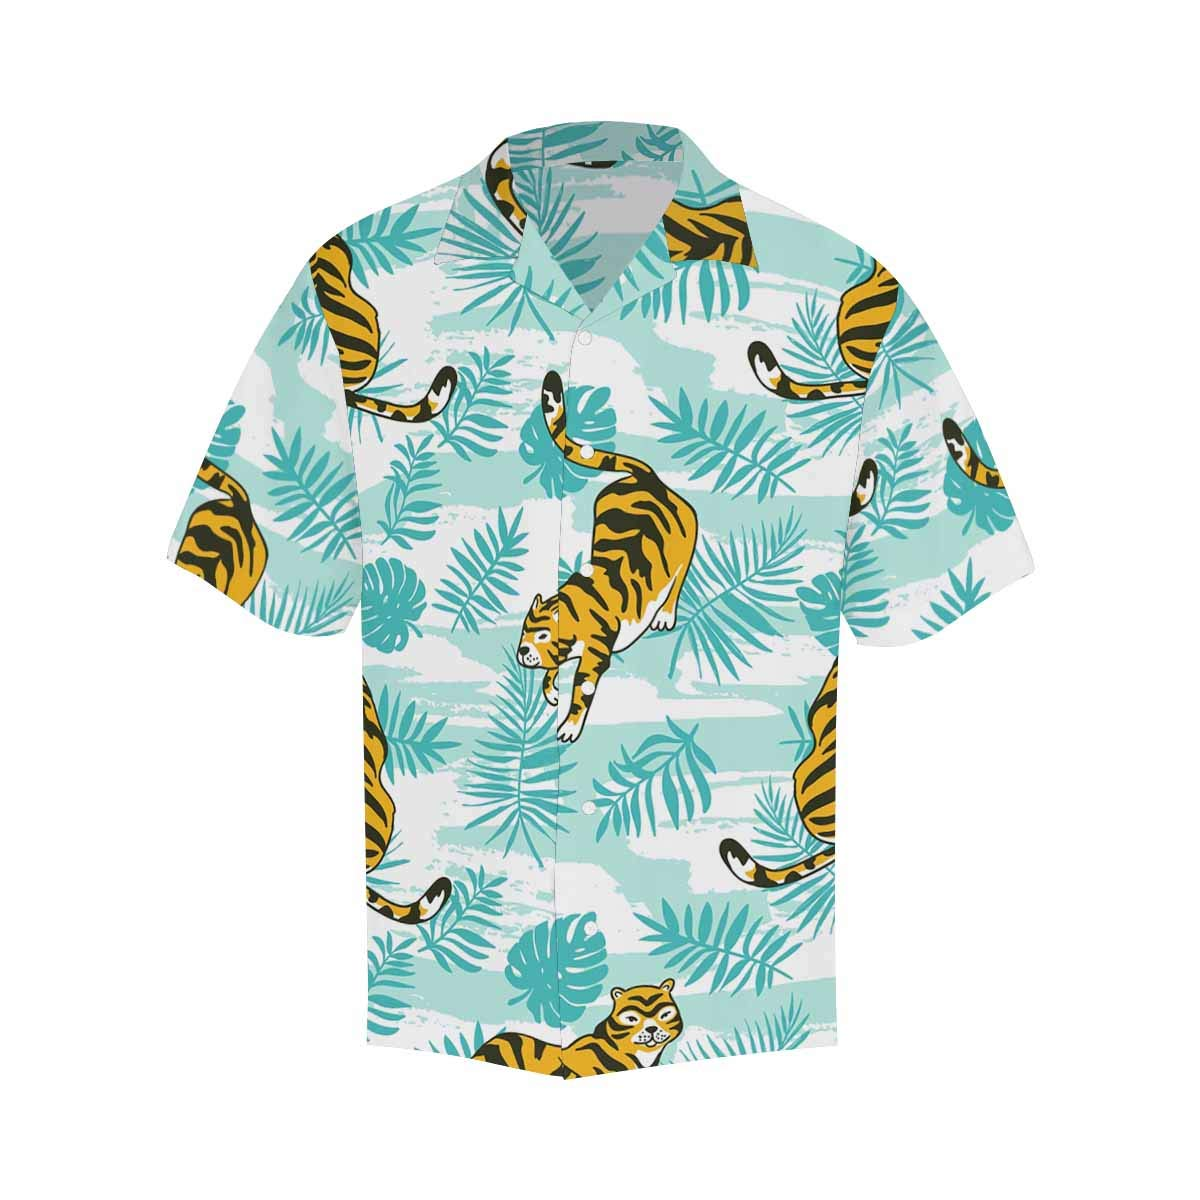 InterestPrint Mens Loose Summer Pink Flamingos Palm Leaves Short Sleeve Button Front Summer Printed Shirt for Men